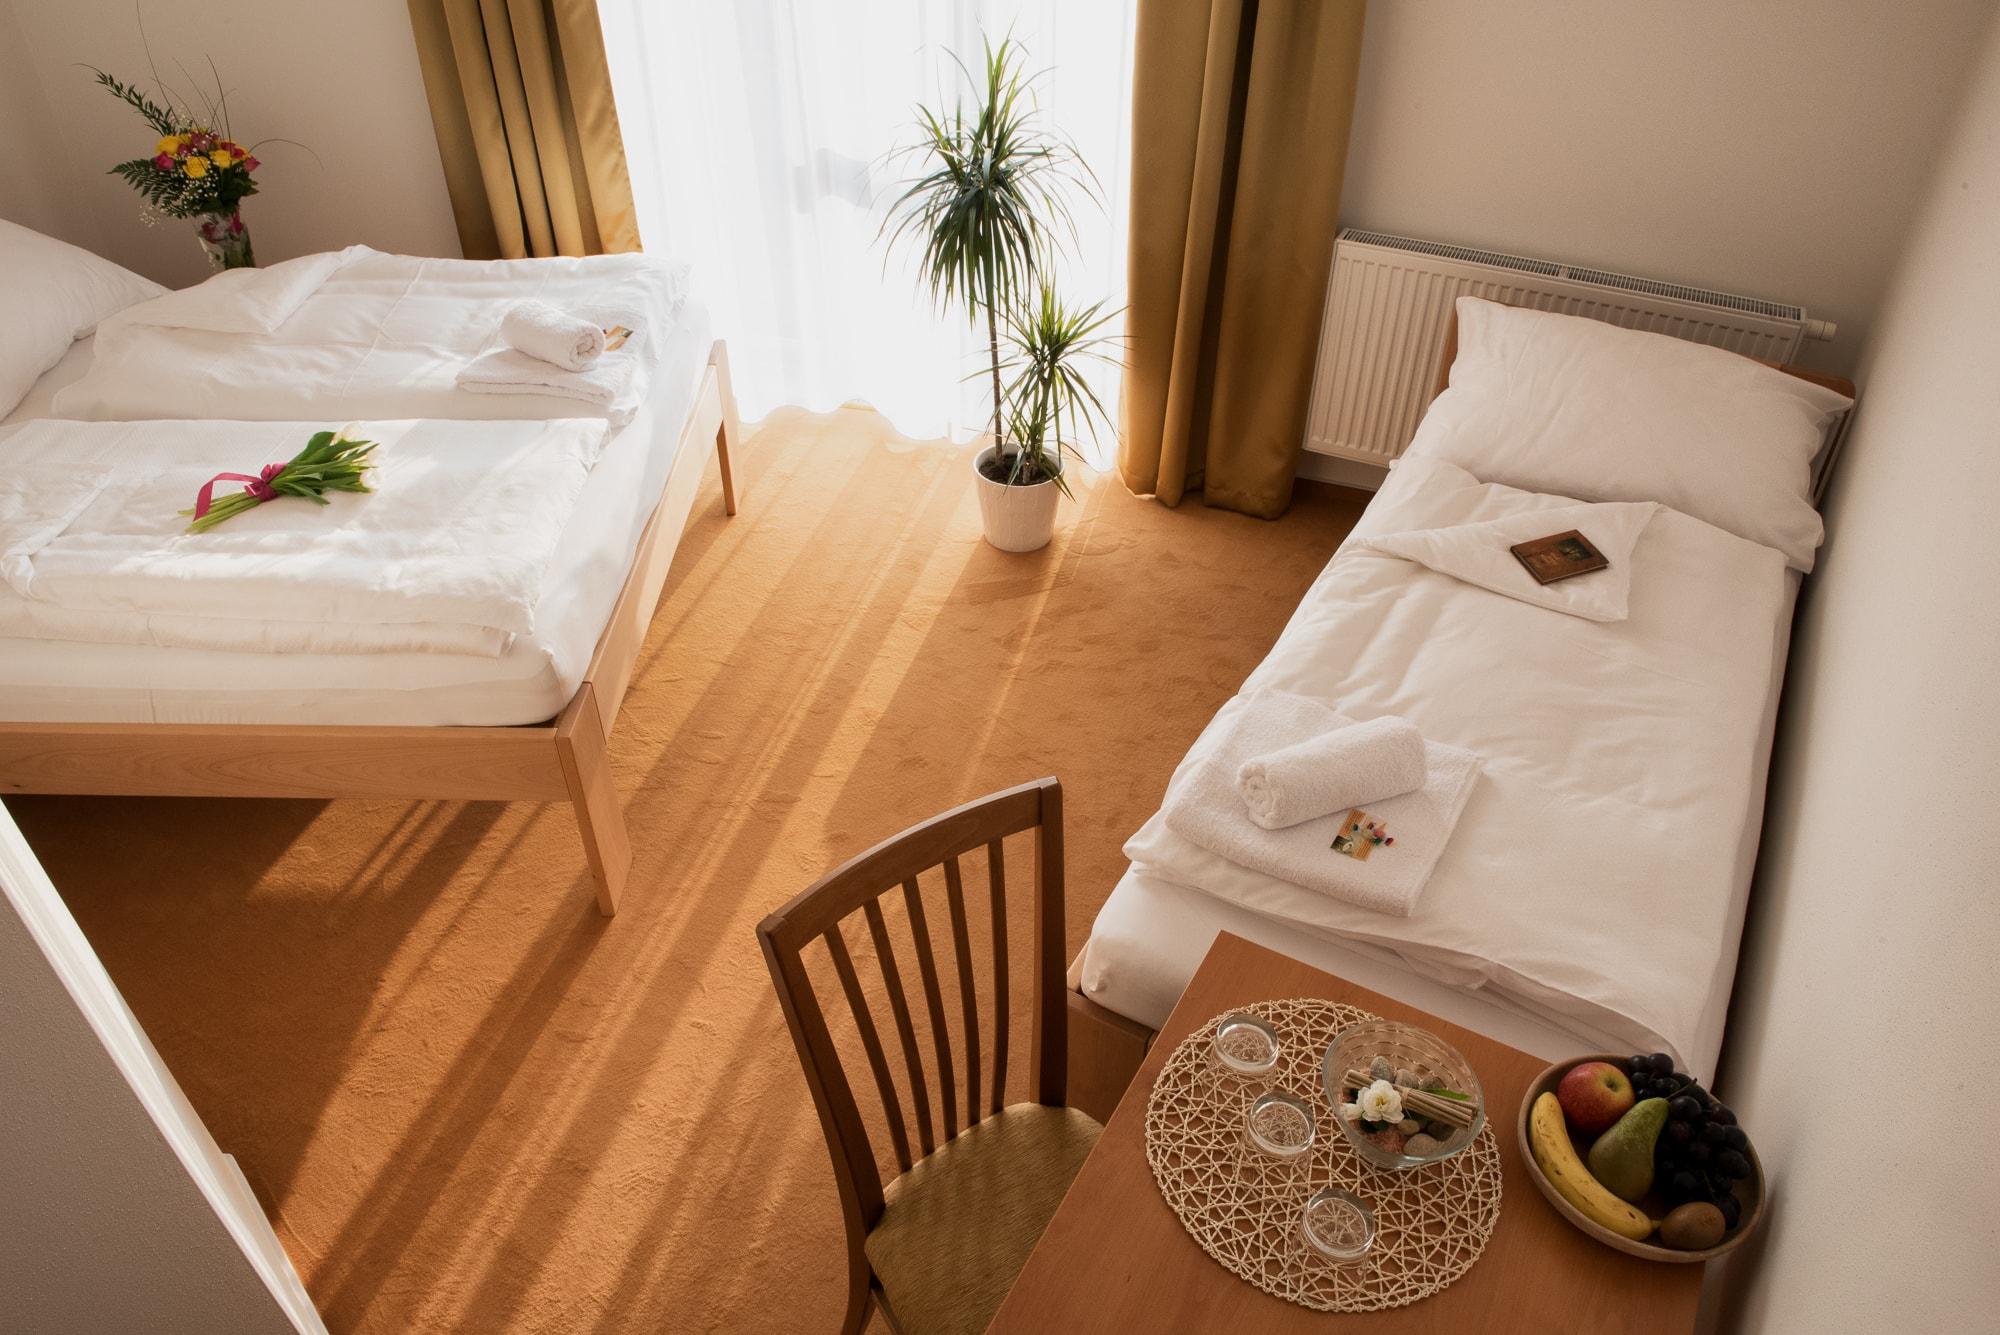 Hotel Kalimeta pokoj-min